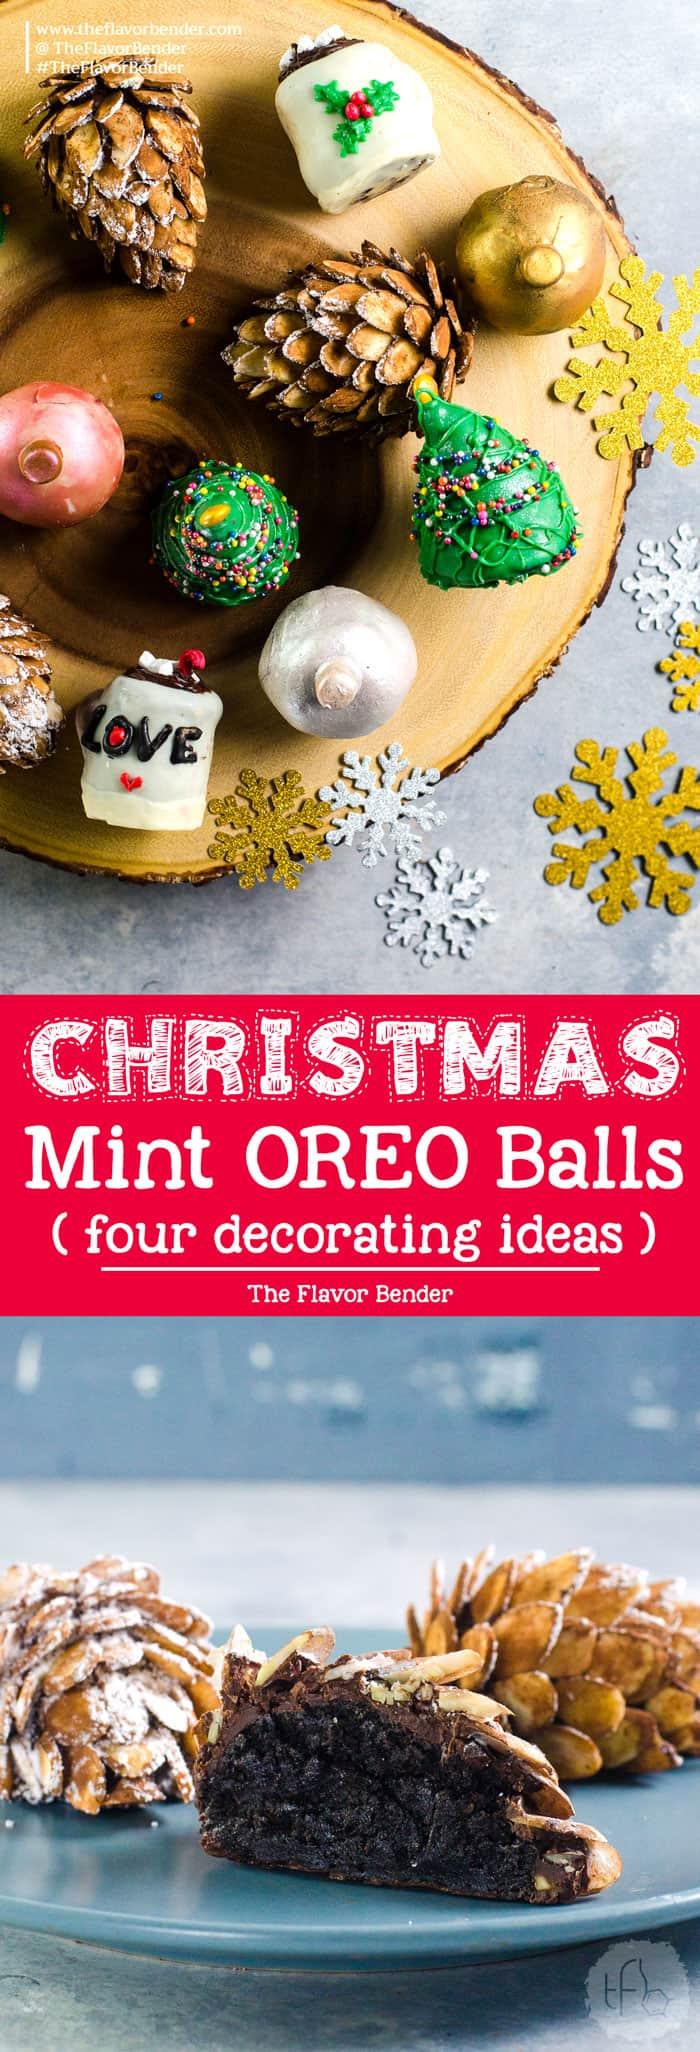 Christmas OREO balls - Fun and easy decoration ideas for these Mint Oreo Truffles! Christmas baubles truffles, Hot cocoa mug truffles, pine cone truffles, and Christmas tree truffles. Perfect for gifting for the holiday season!